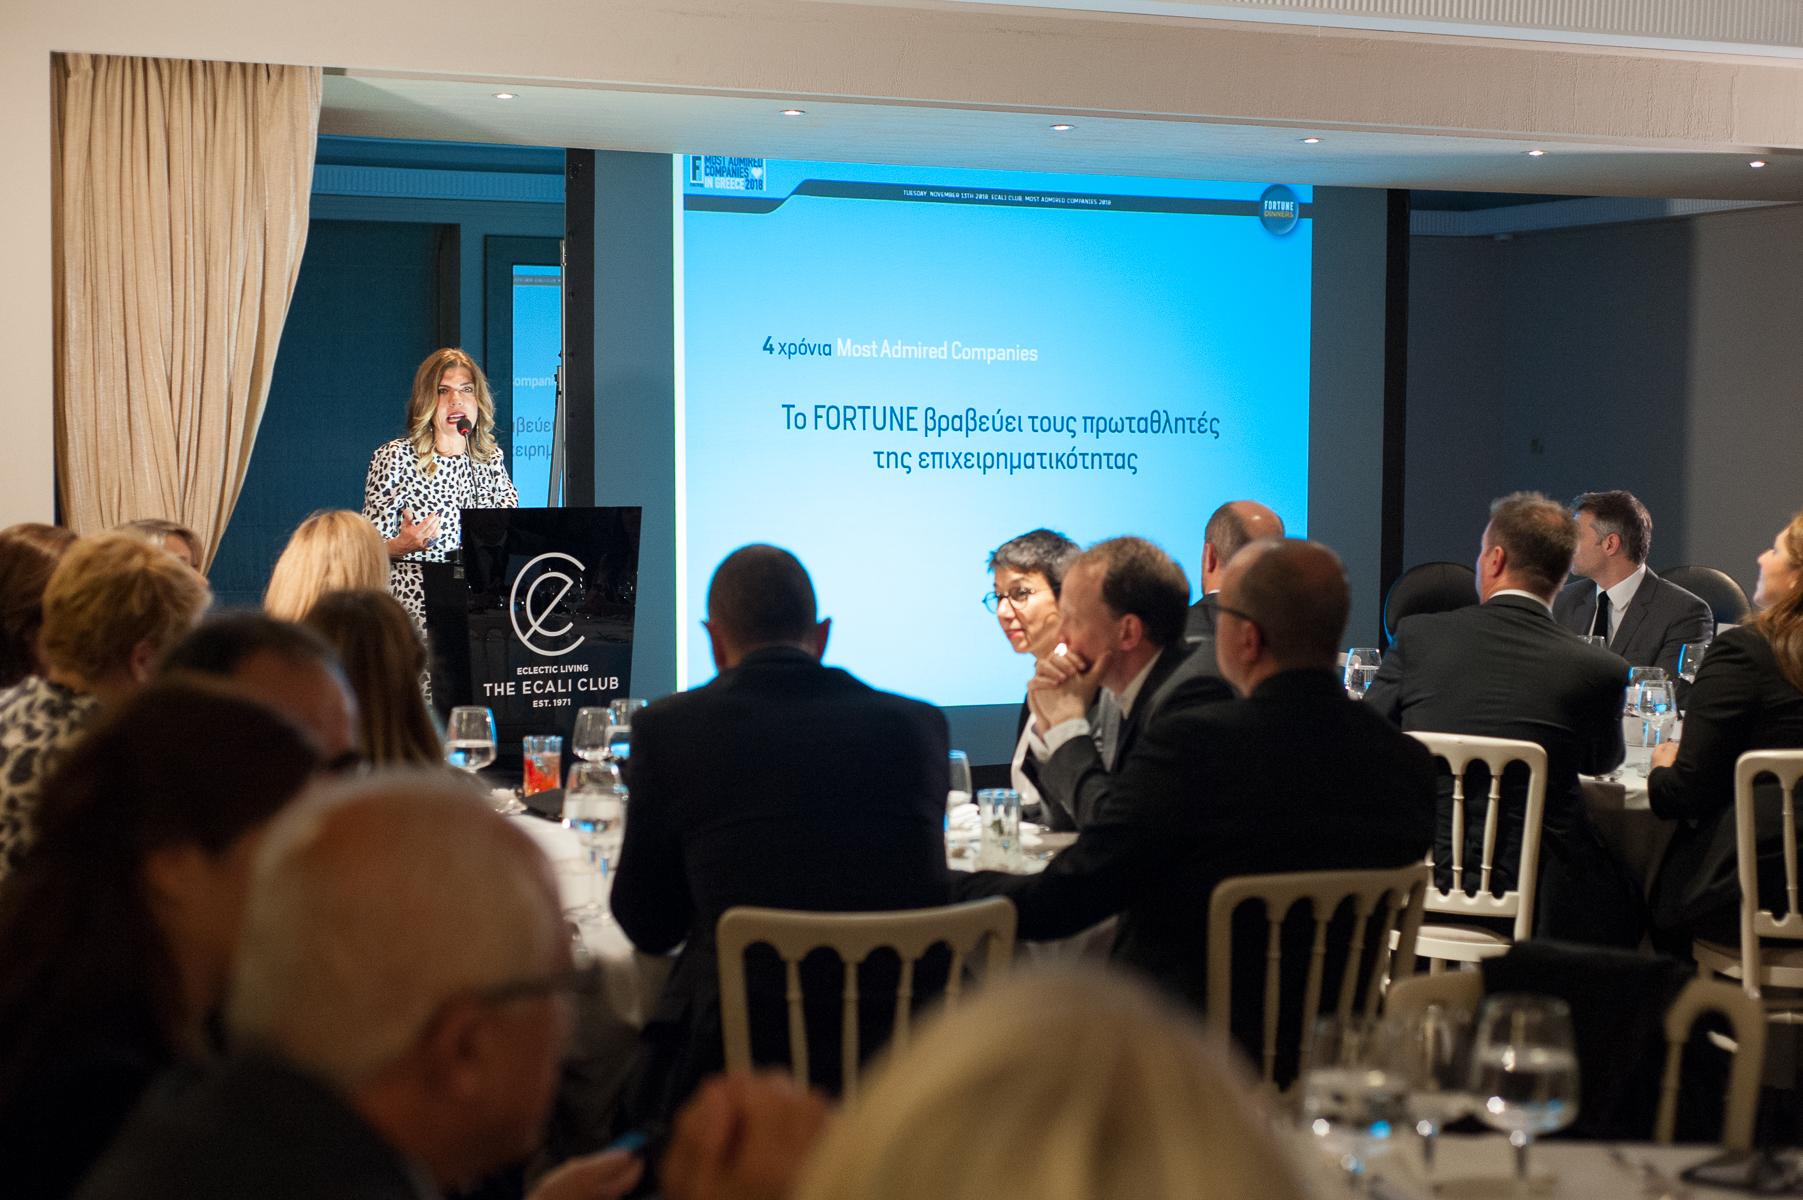 Fortune Dinner στο Ecali Club: Οι πιο αξιοθαύμαστες εταιρείες στην Ελλάδα βραβεύτηκαν σε μια ξεχωριστή εκδήλωση